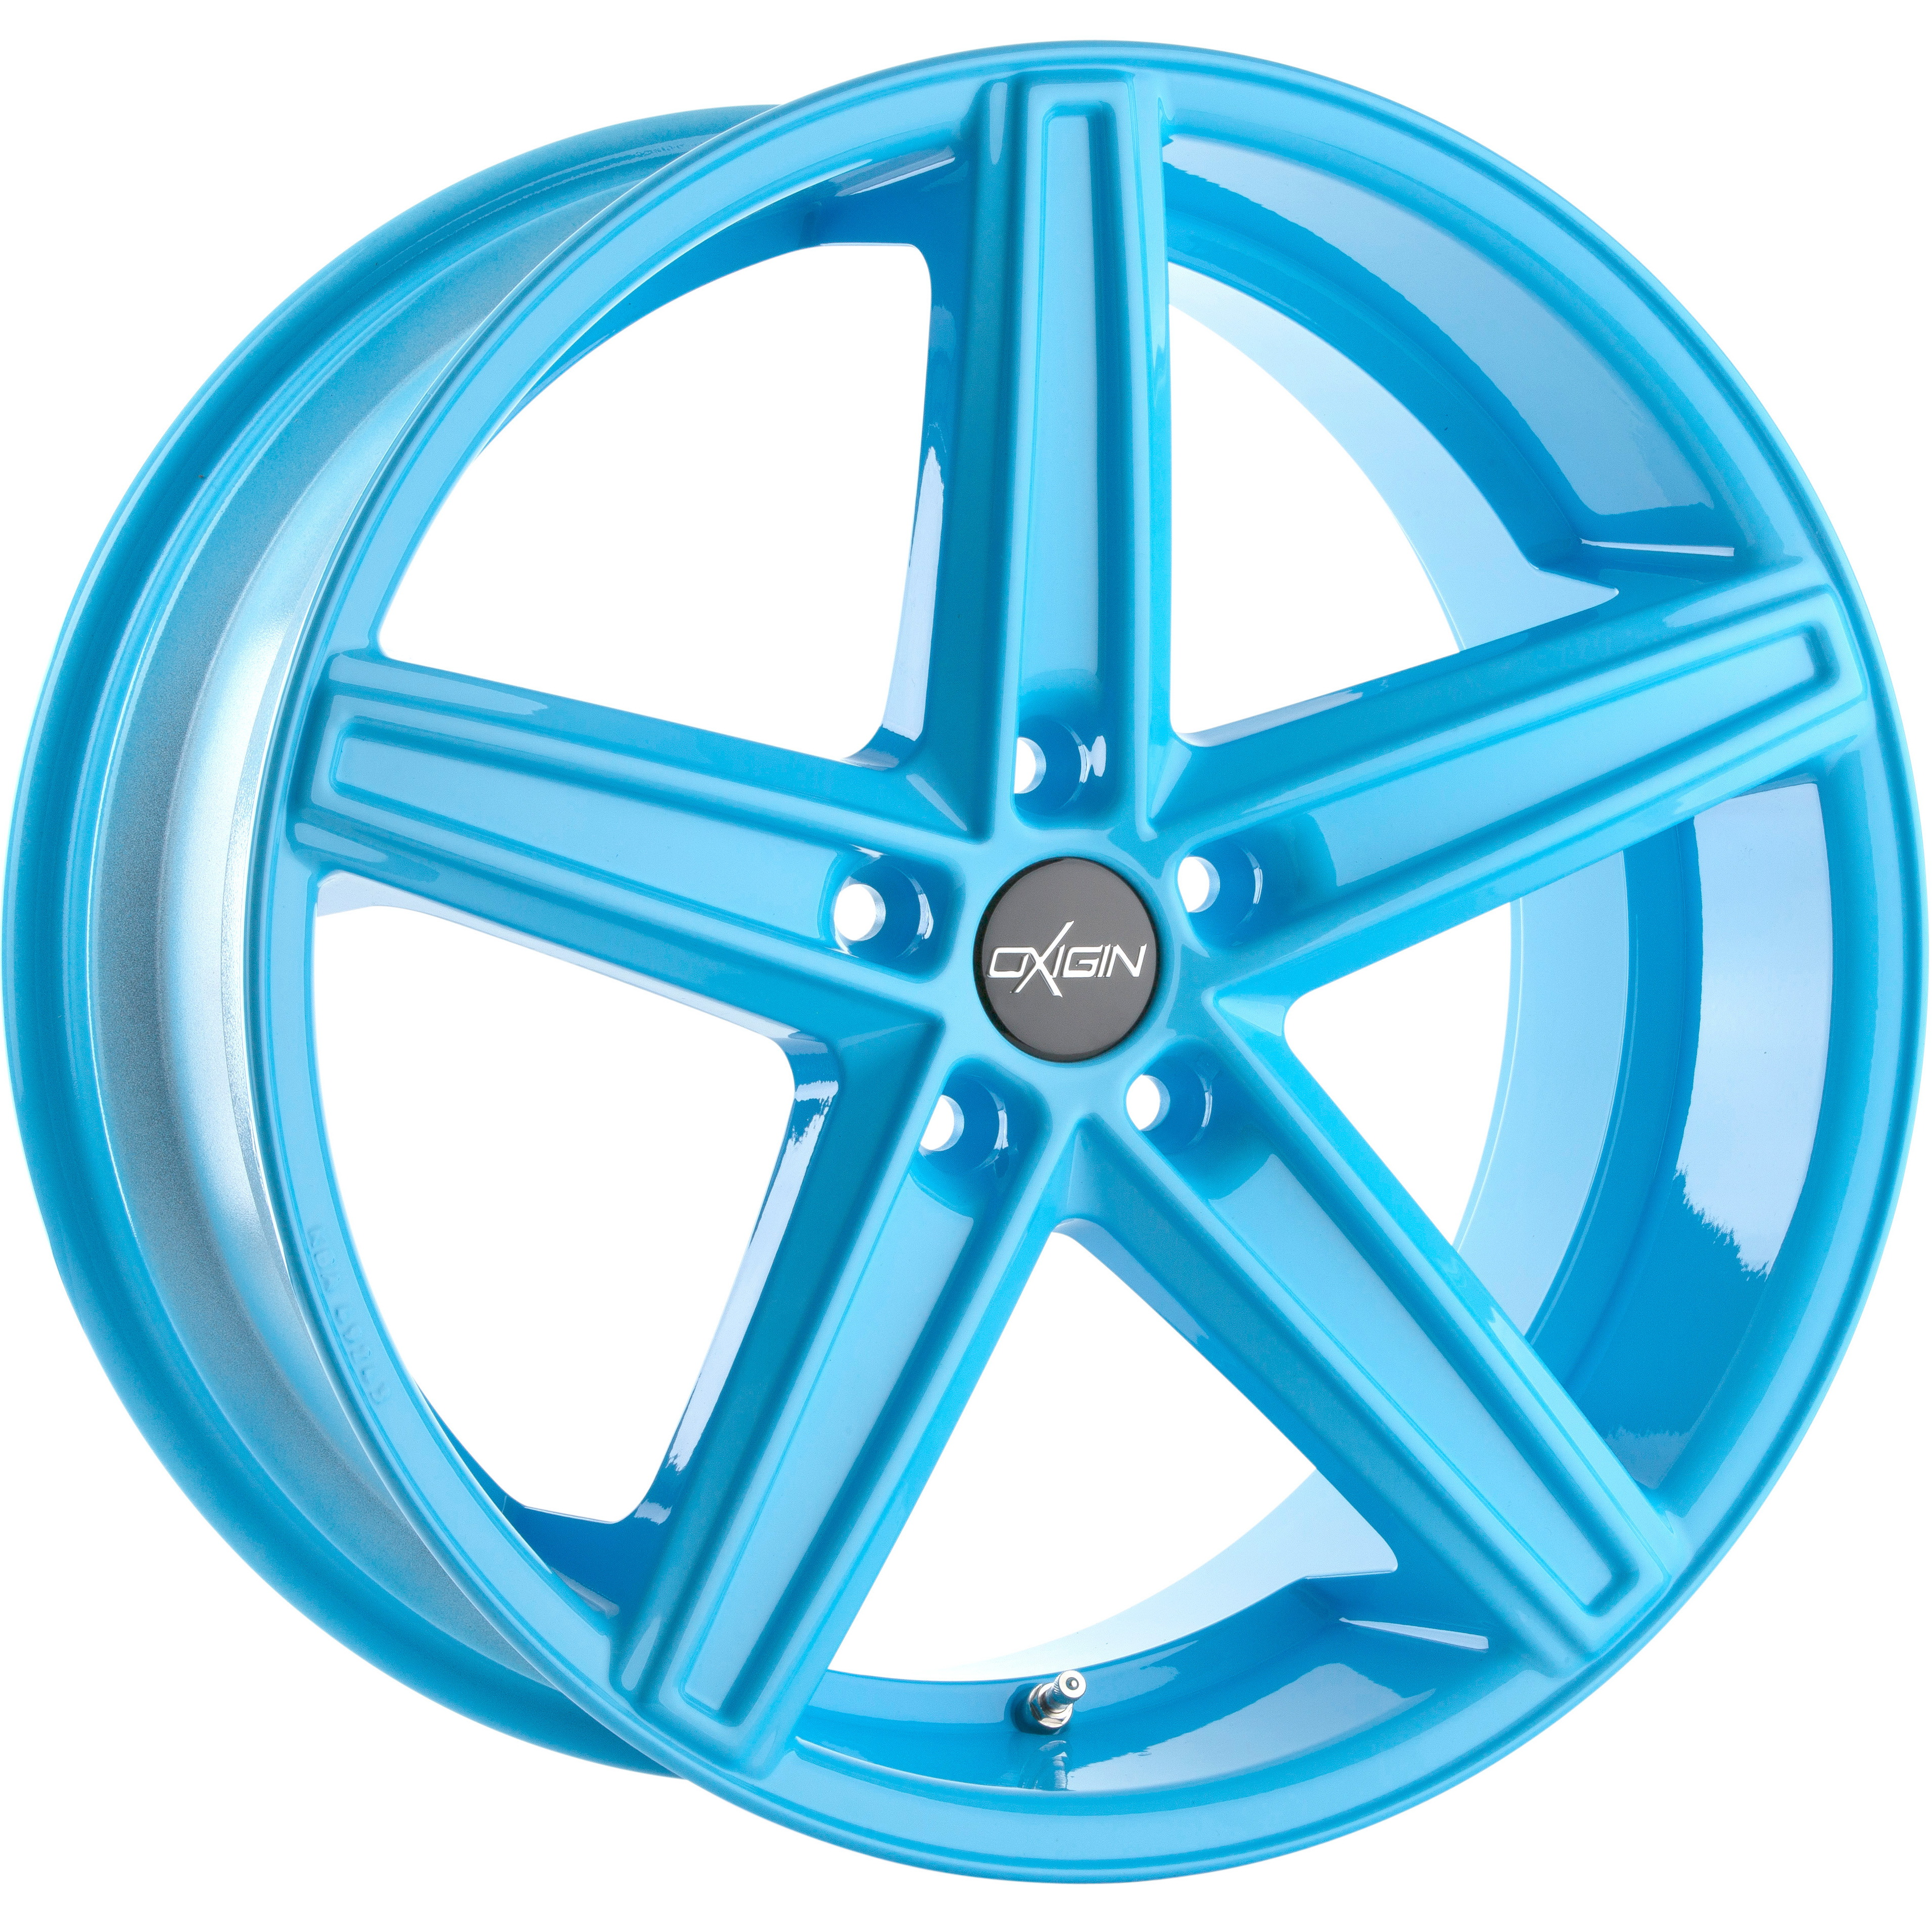 Oxigin OX 18 neon blue